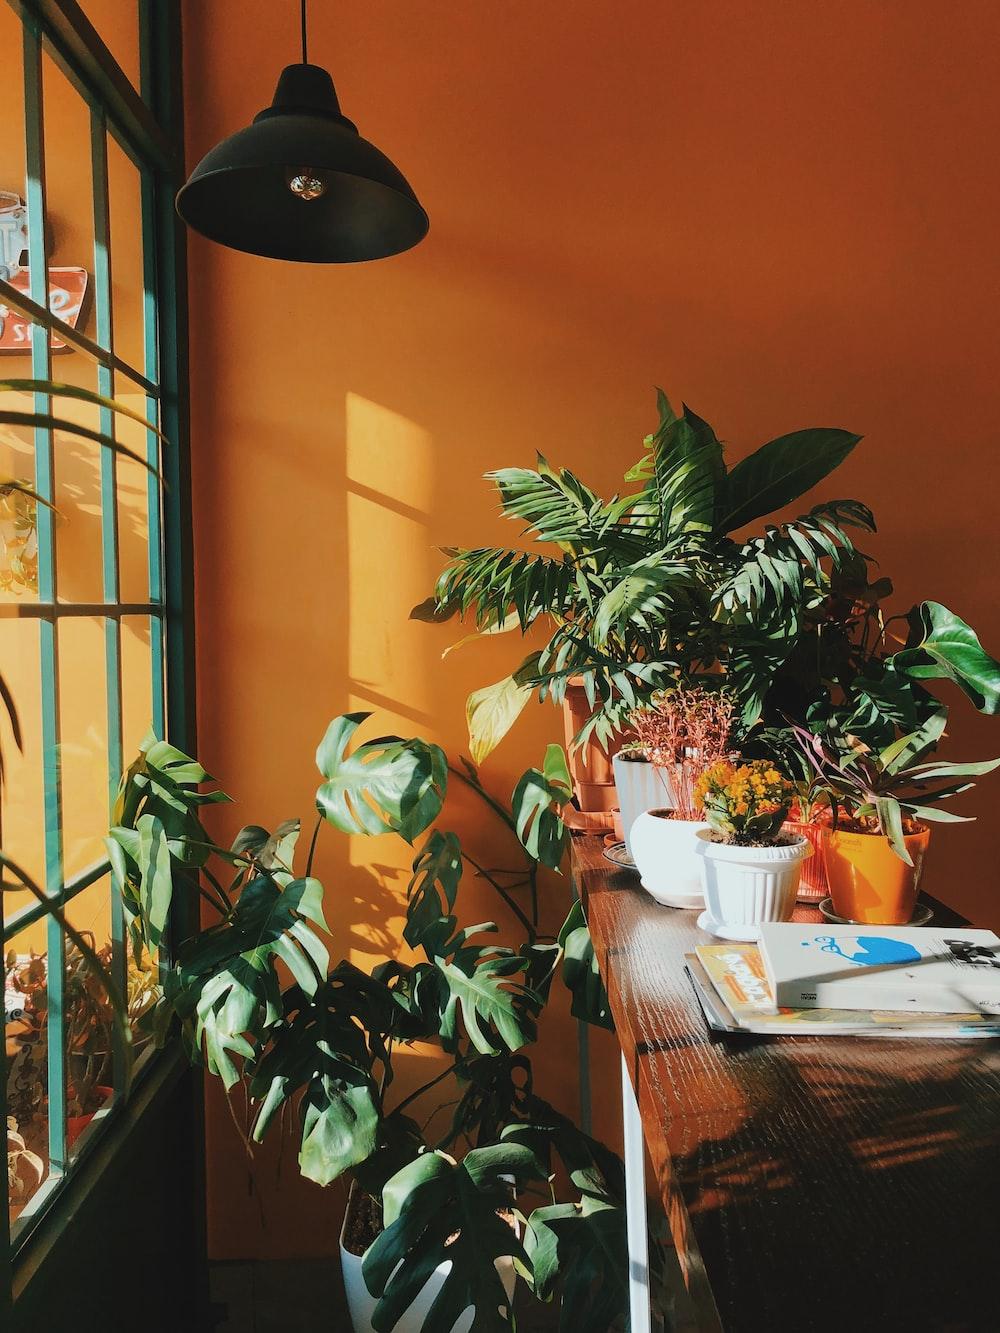 green-leafed plants beside table inside room